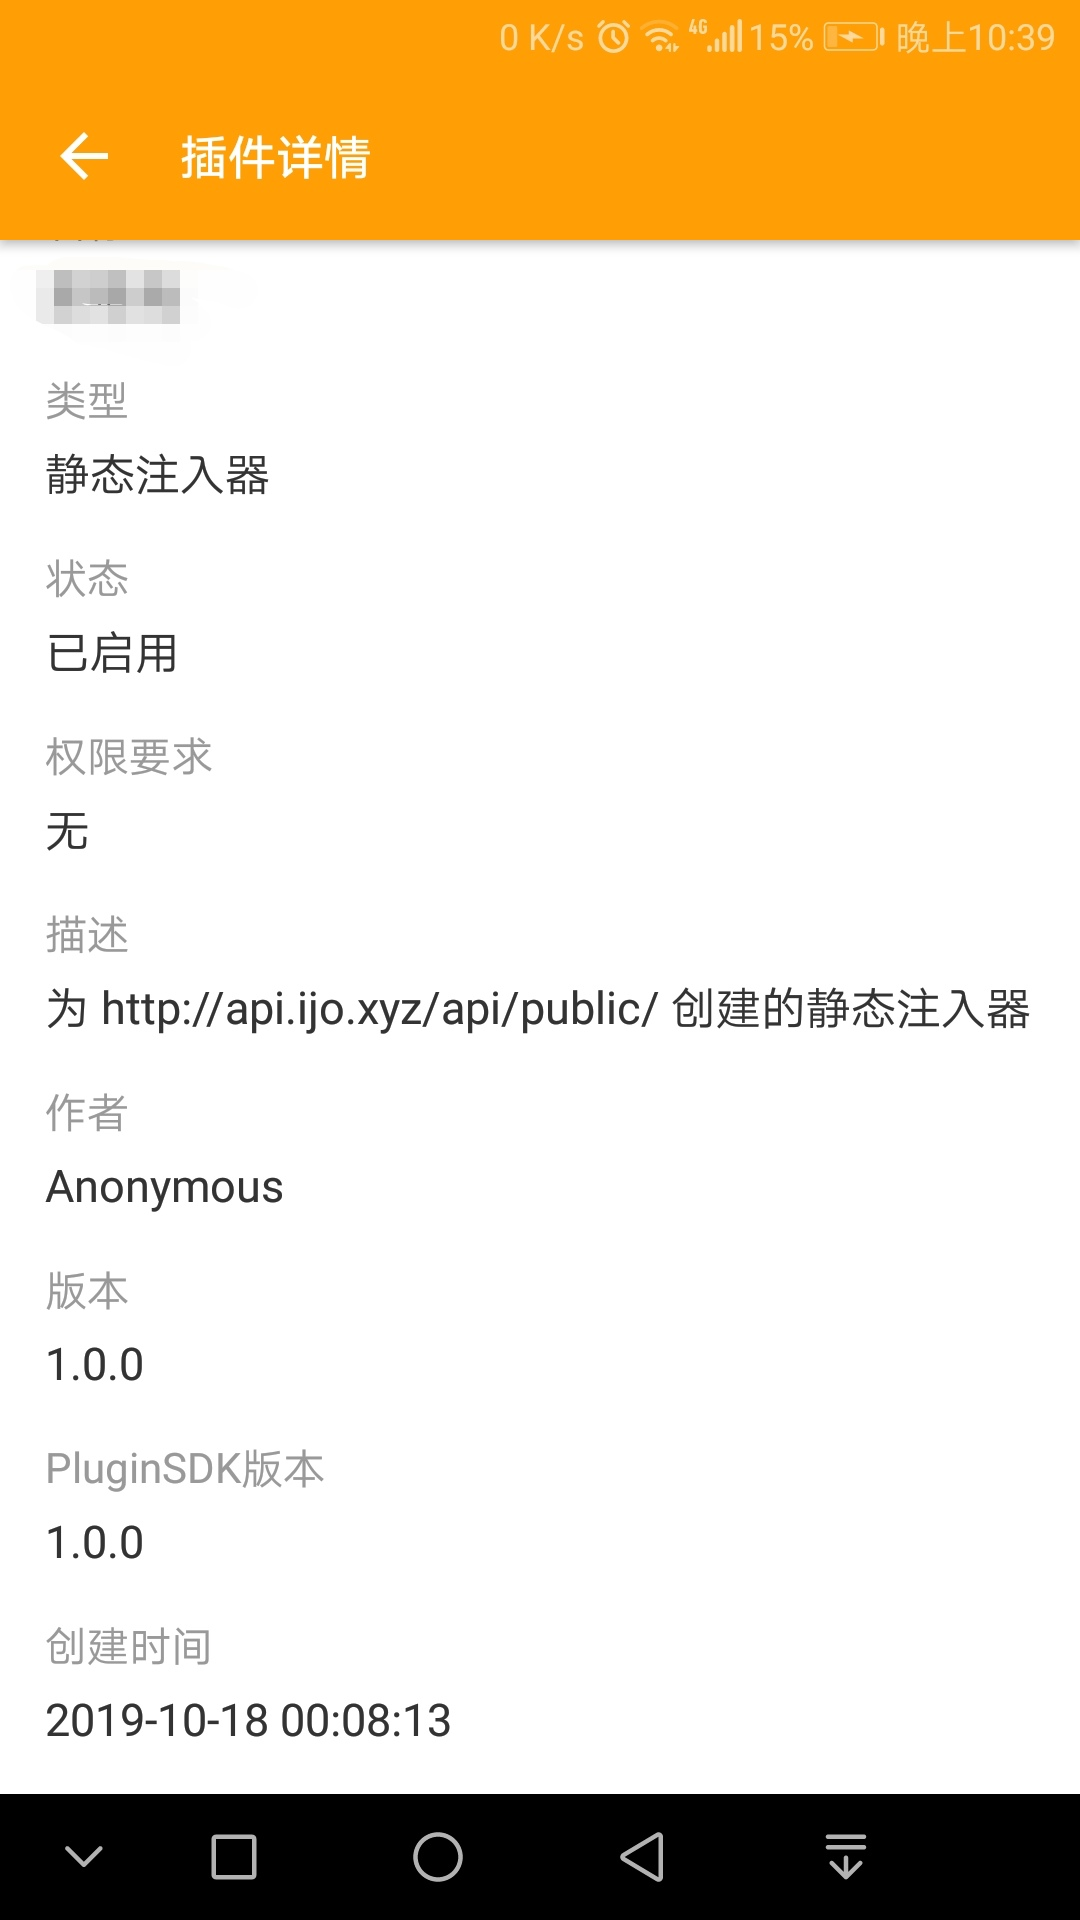 【DMT】黄鸟破某海教程-www.im86.com